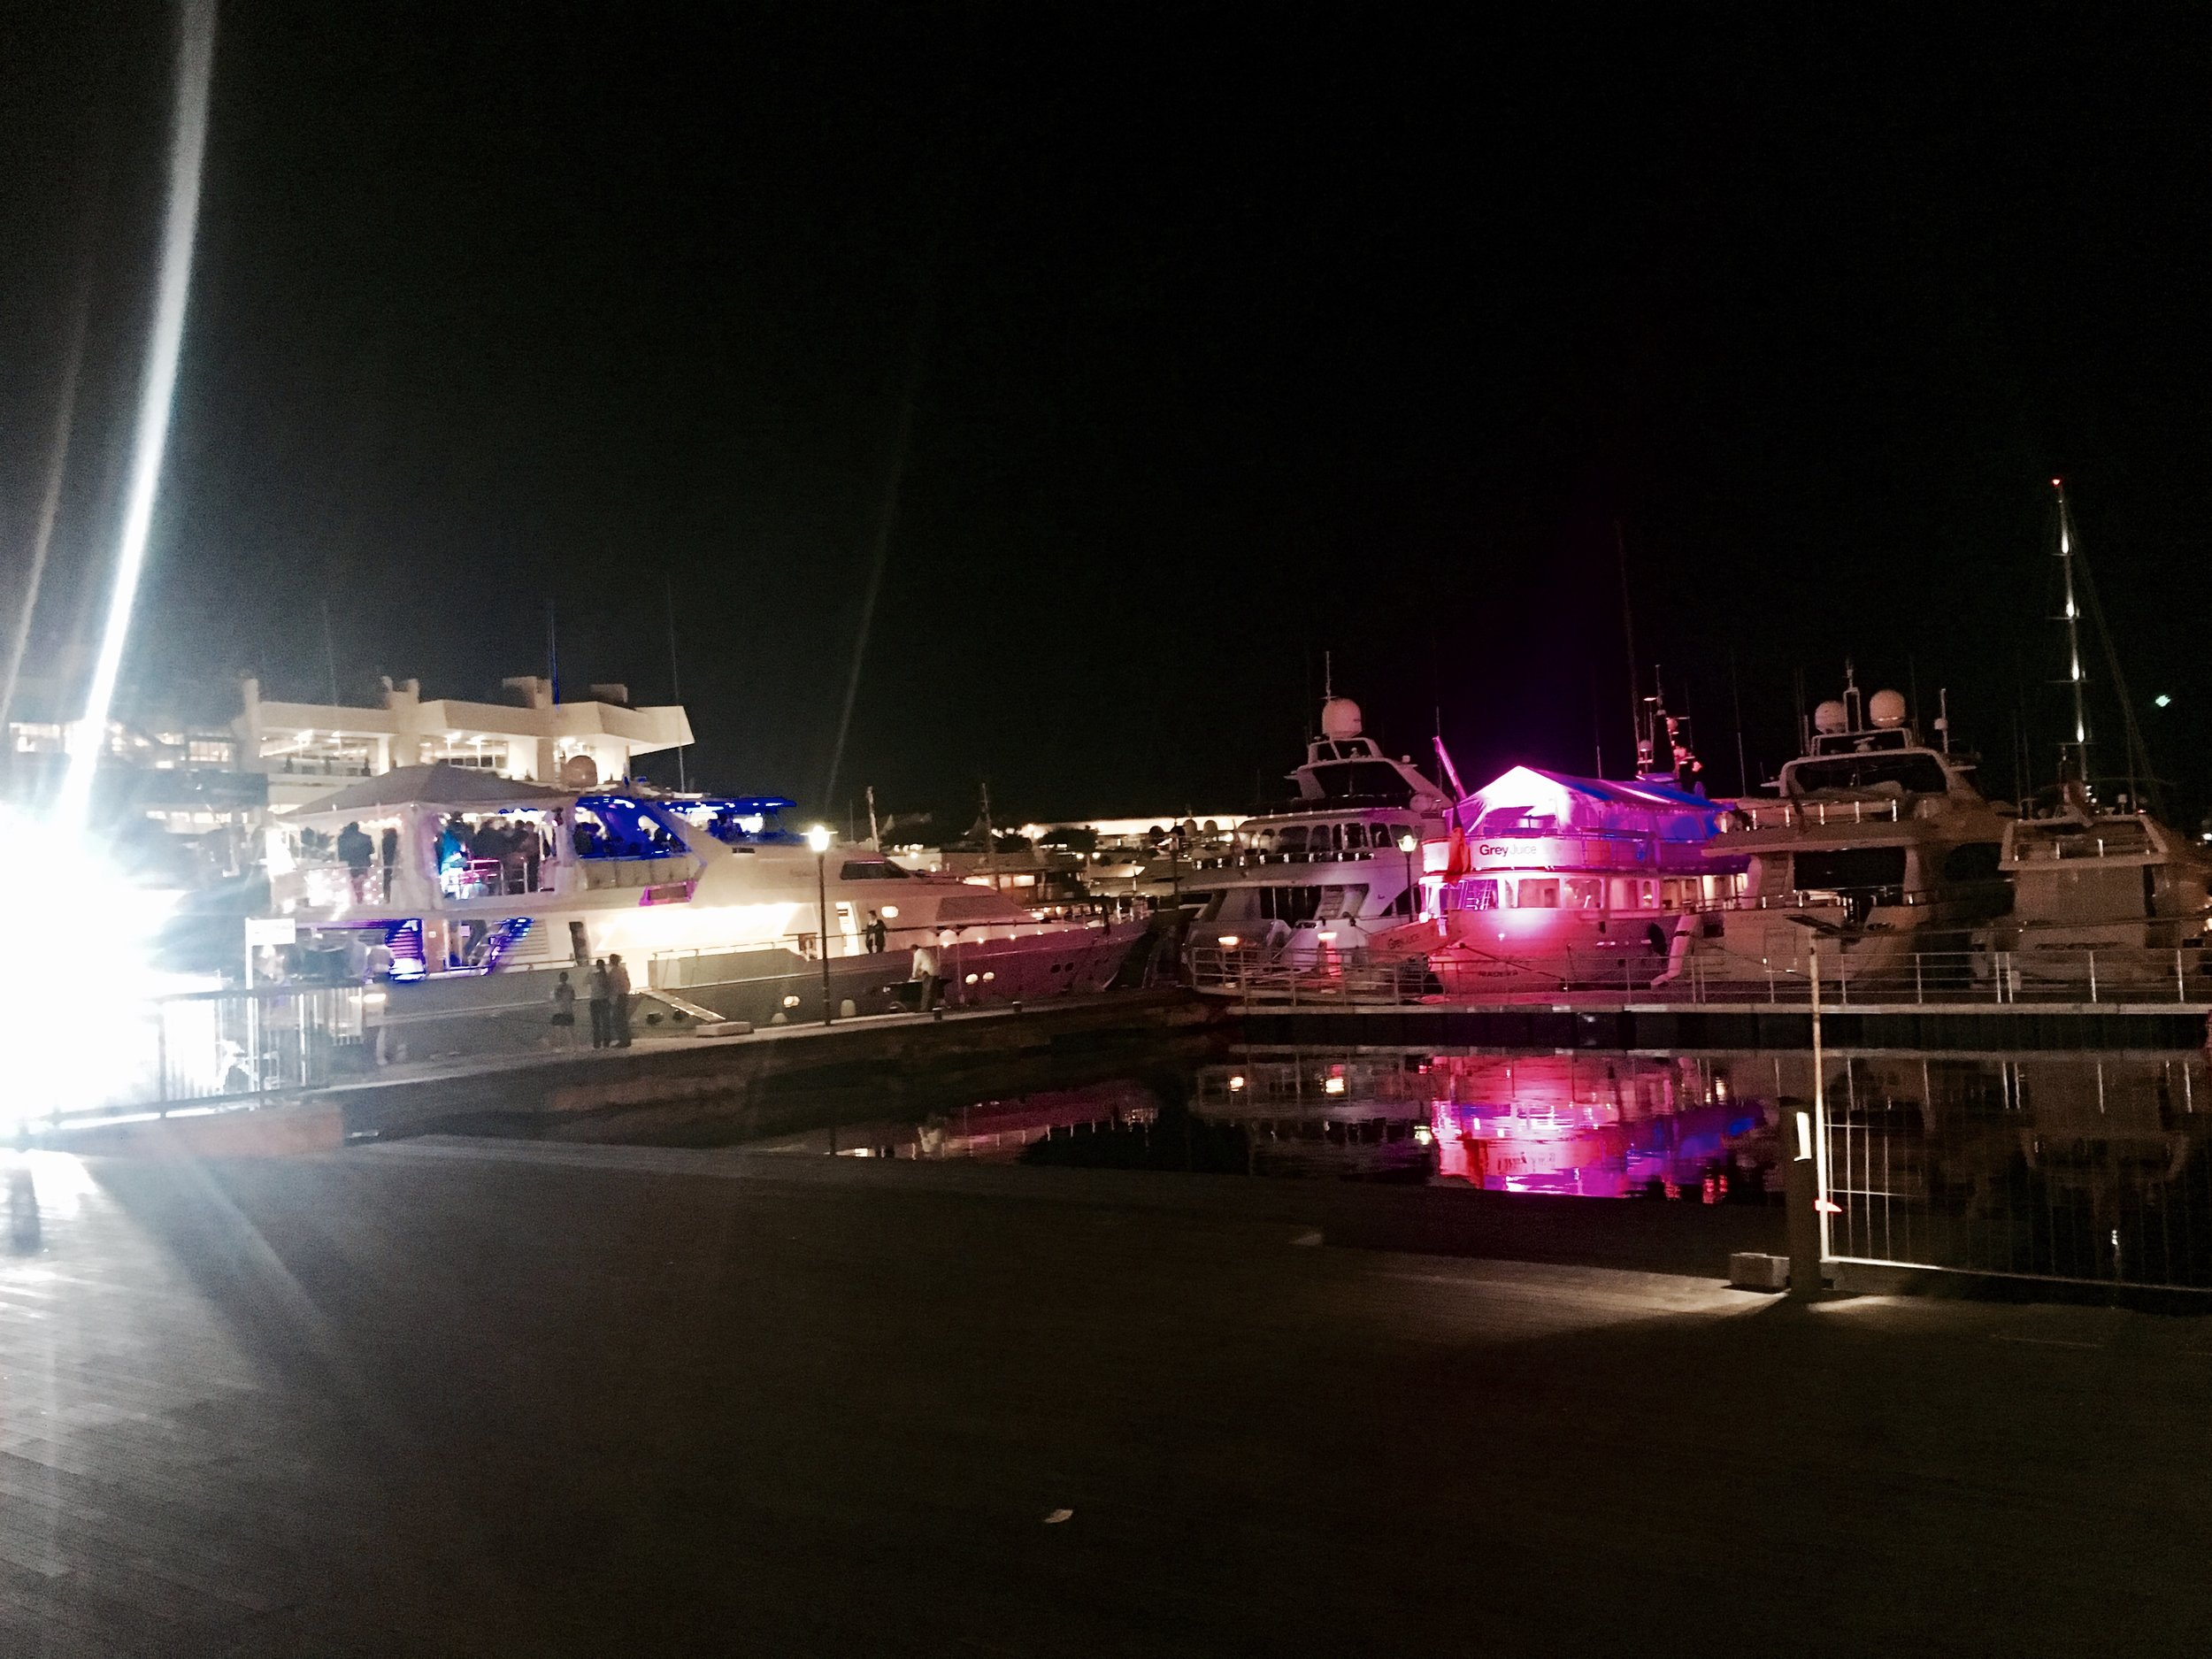 mip boats night.jpg